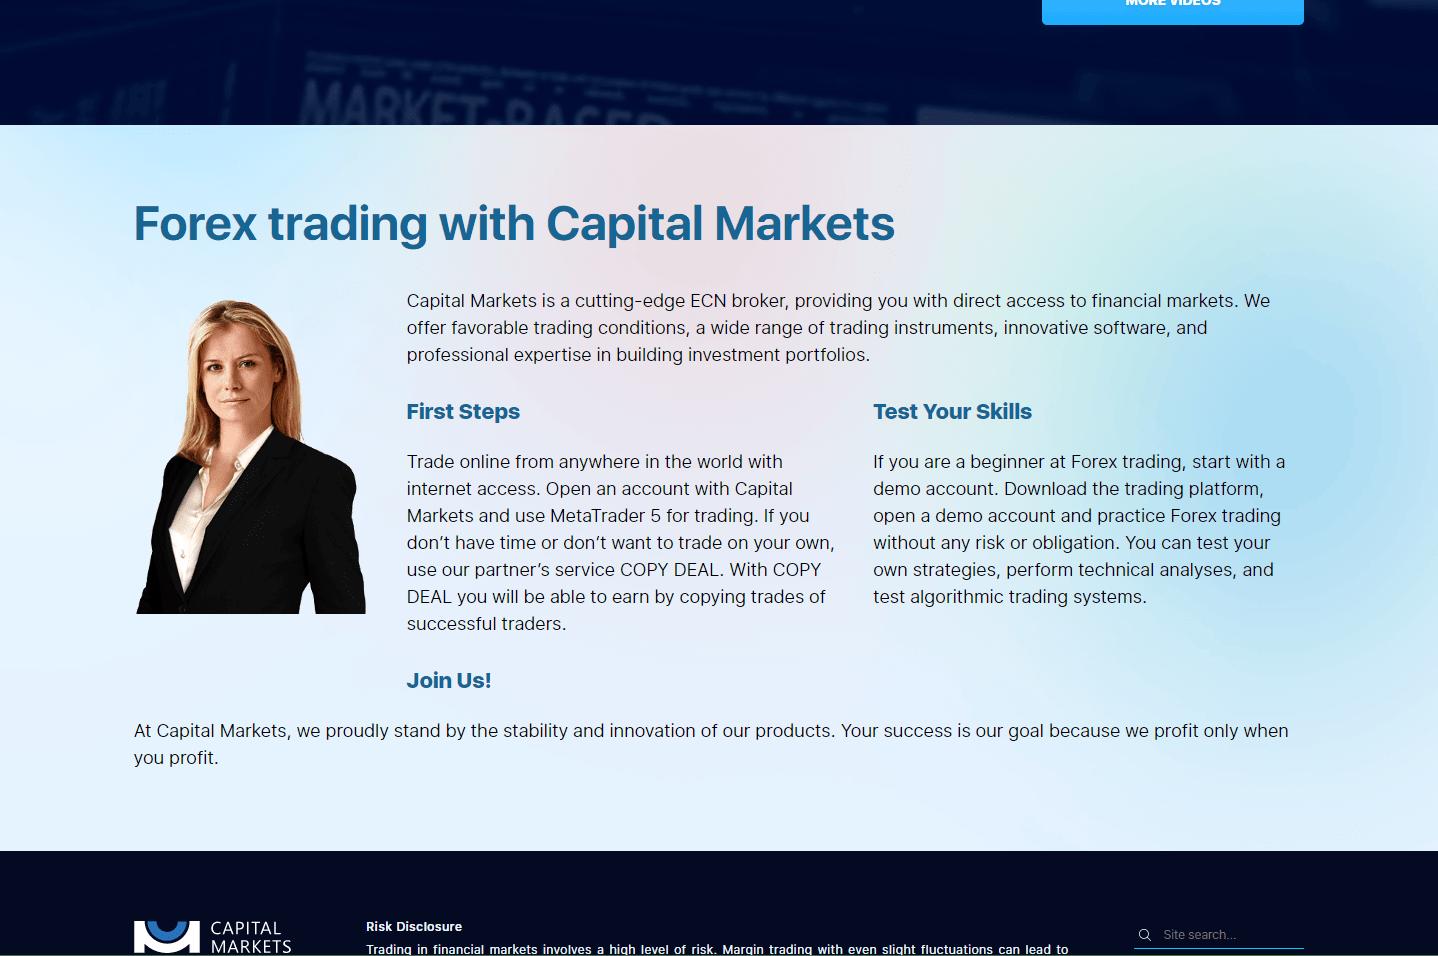 Capital Markets - реальные отзывы о capital-markets.com